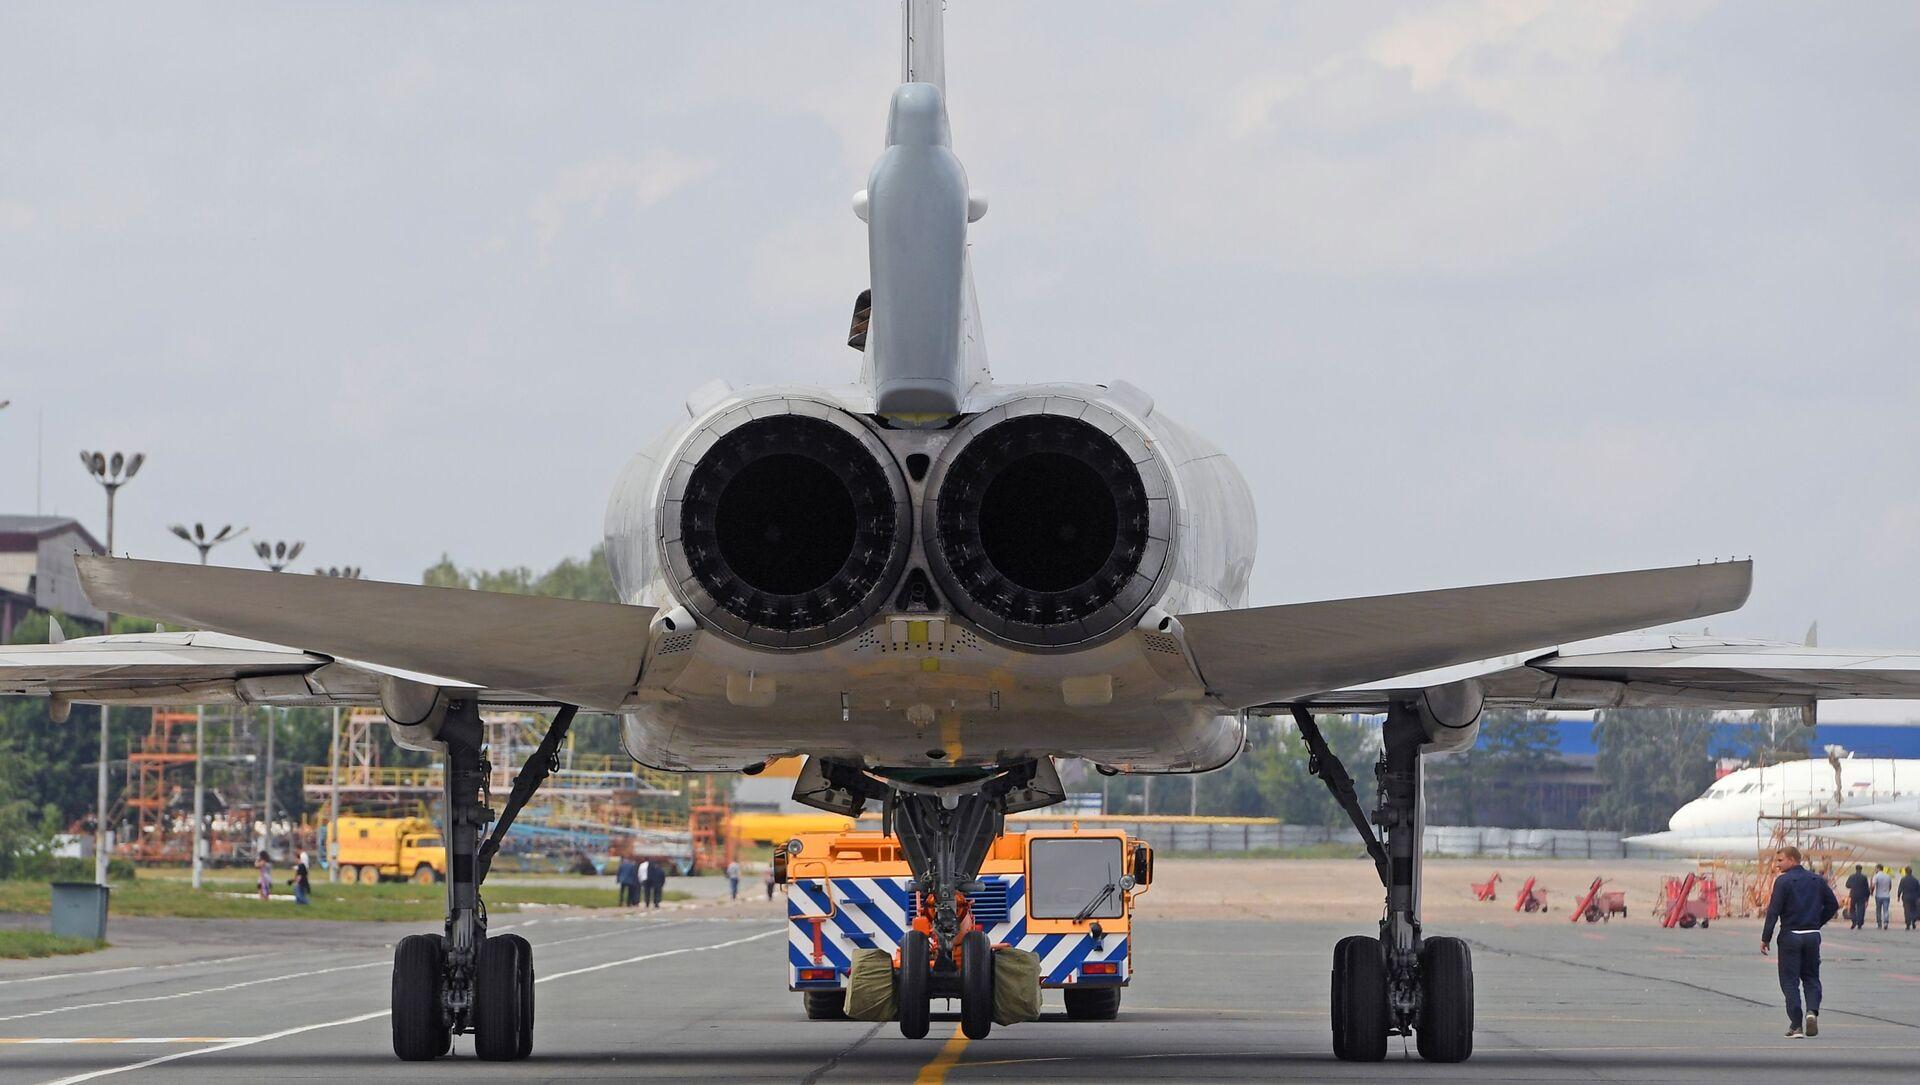 Tu-22M3M strategic bomber being prepped for flight testing at the Kazan Aviation Plant. - Sputnik International, 1920, 05.08.2021